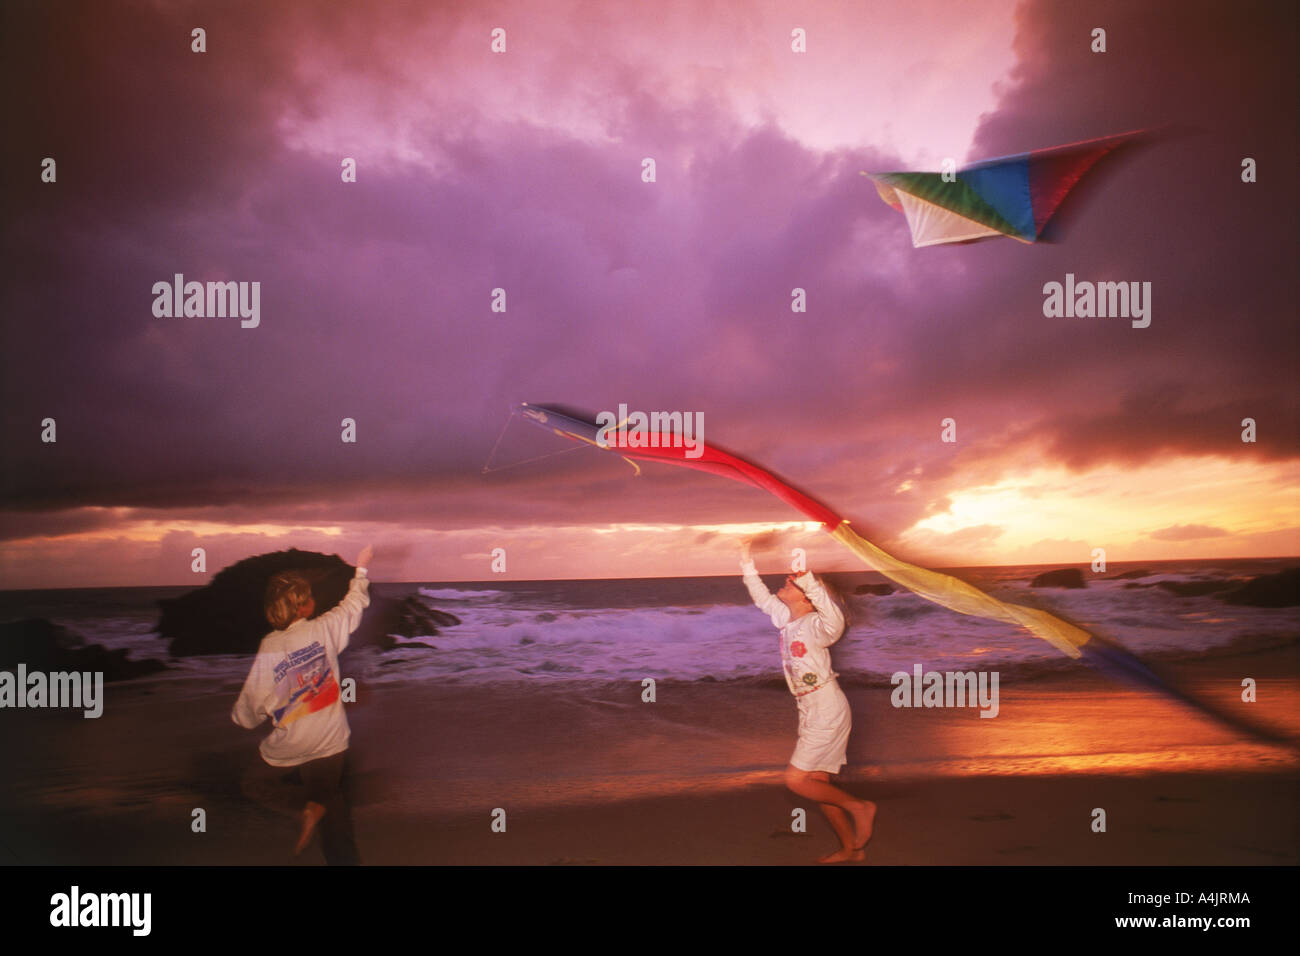 Kids flying kites on windy shore at sunset - Stock Image